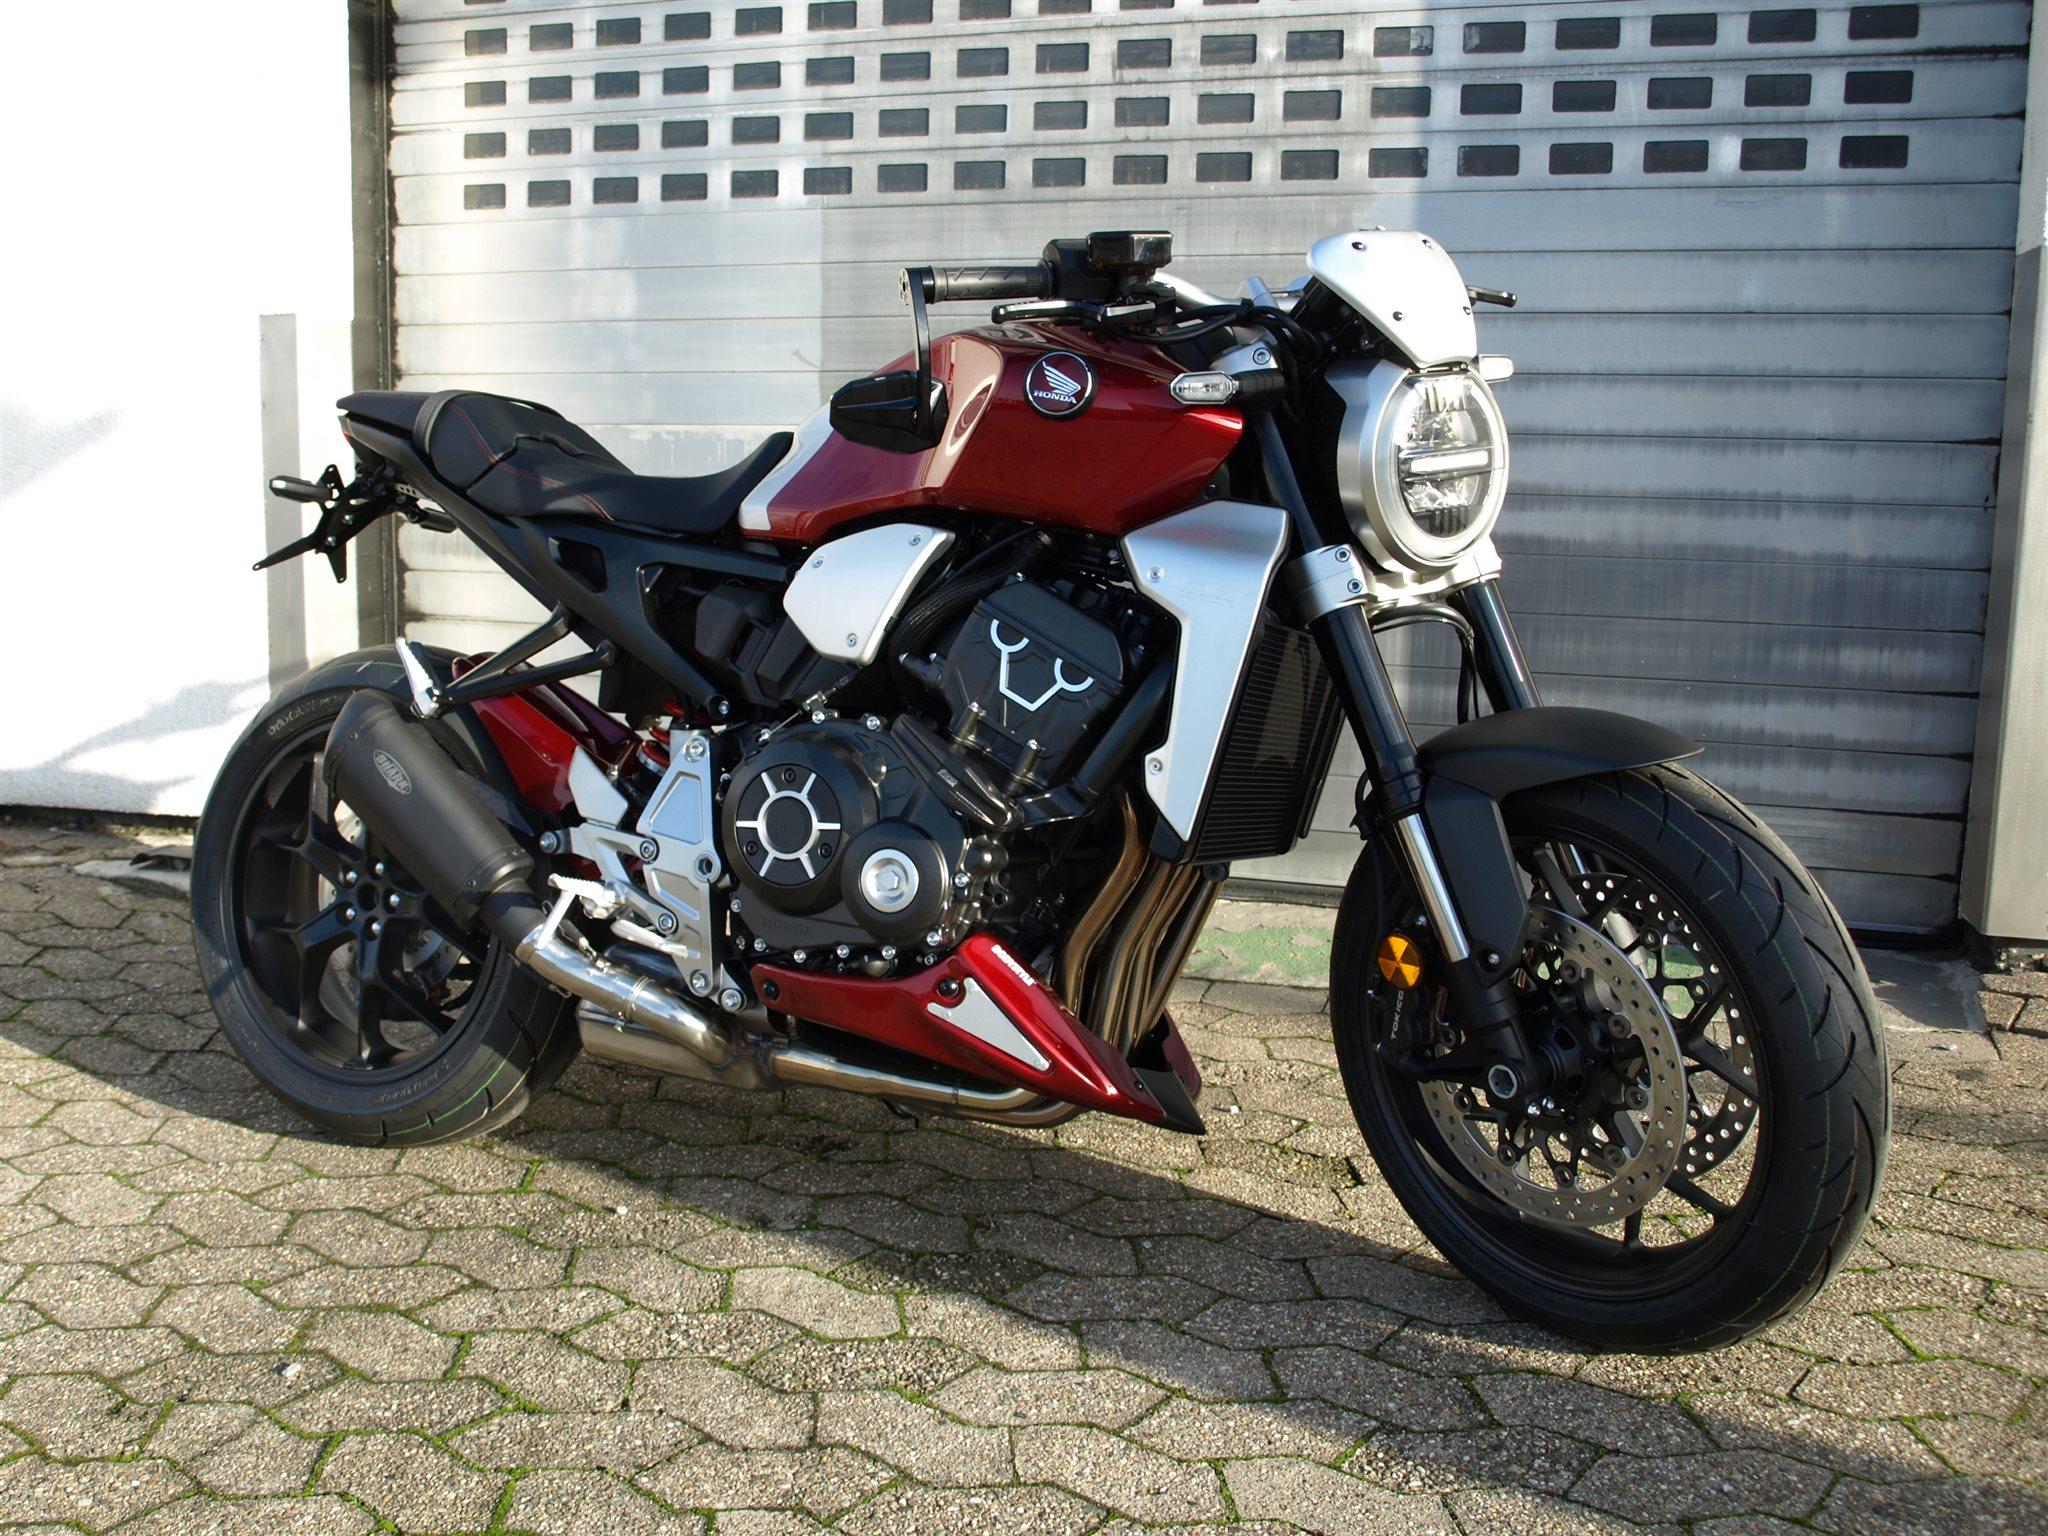 Verleihmotorrad Naked Bike Tuono V4 1100 Factory vom